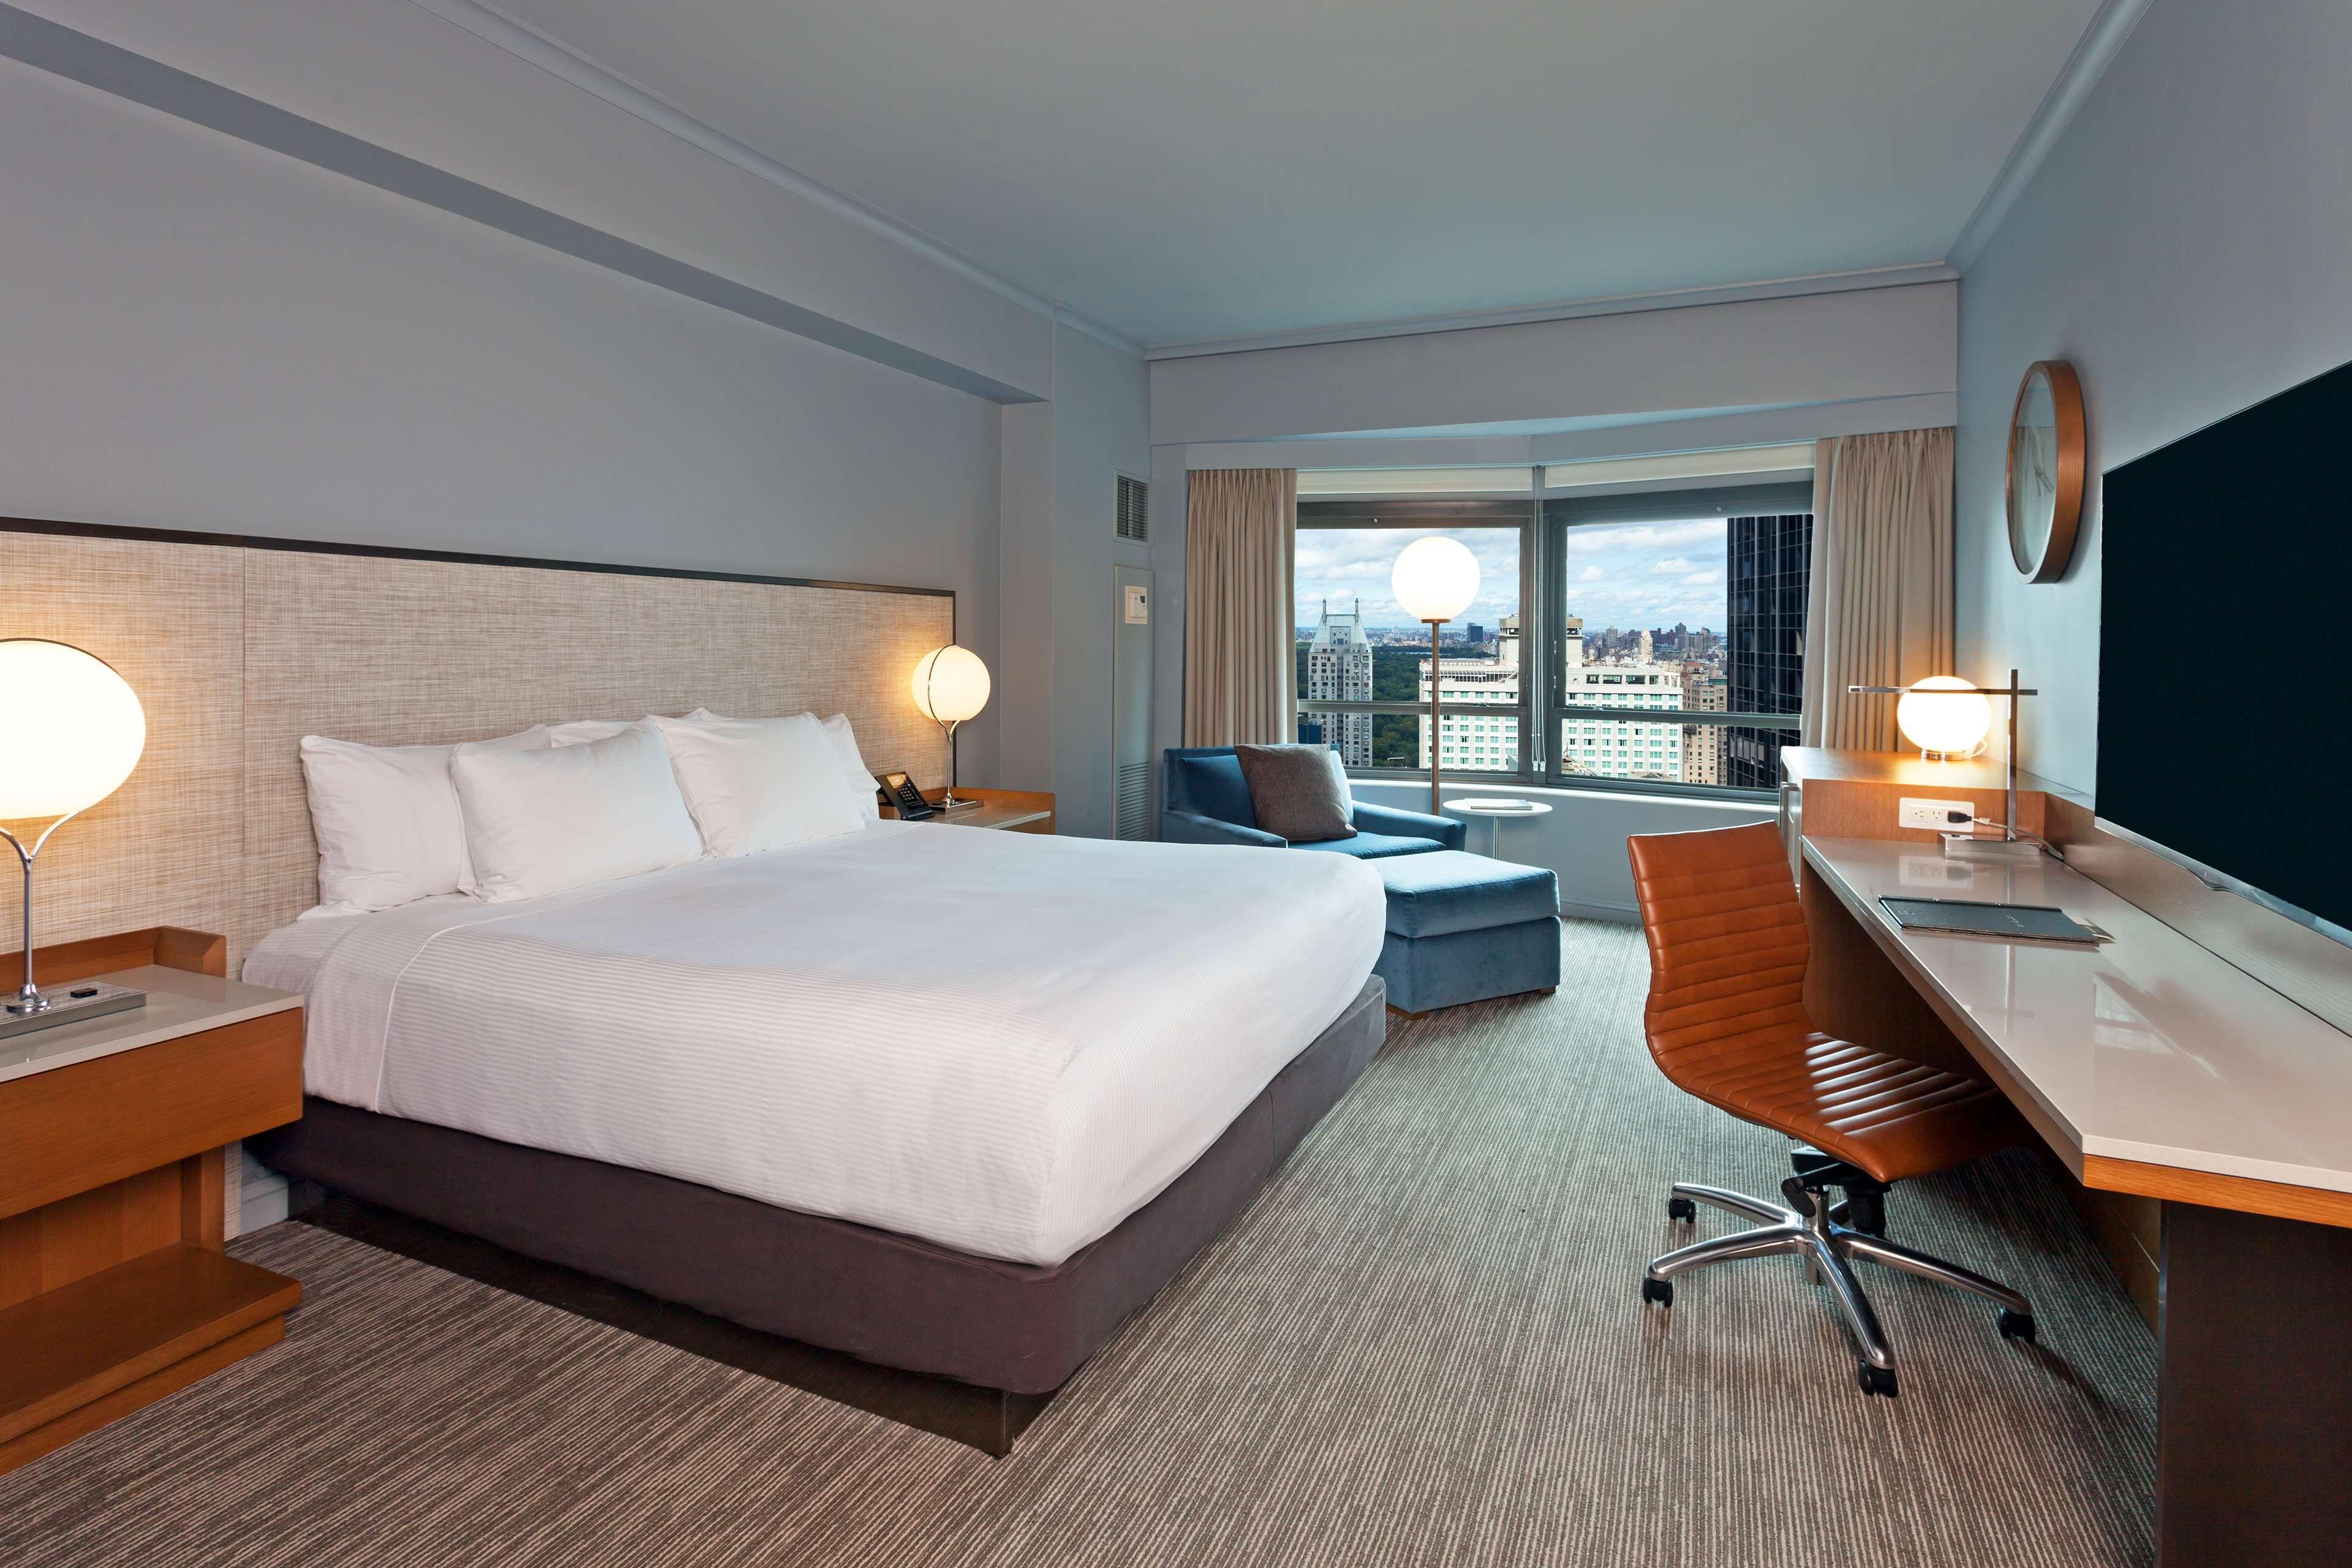 New York Hilton Midtown image 39